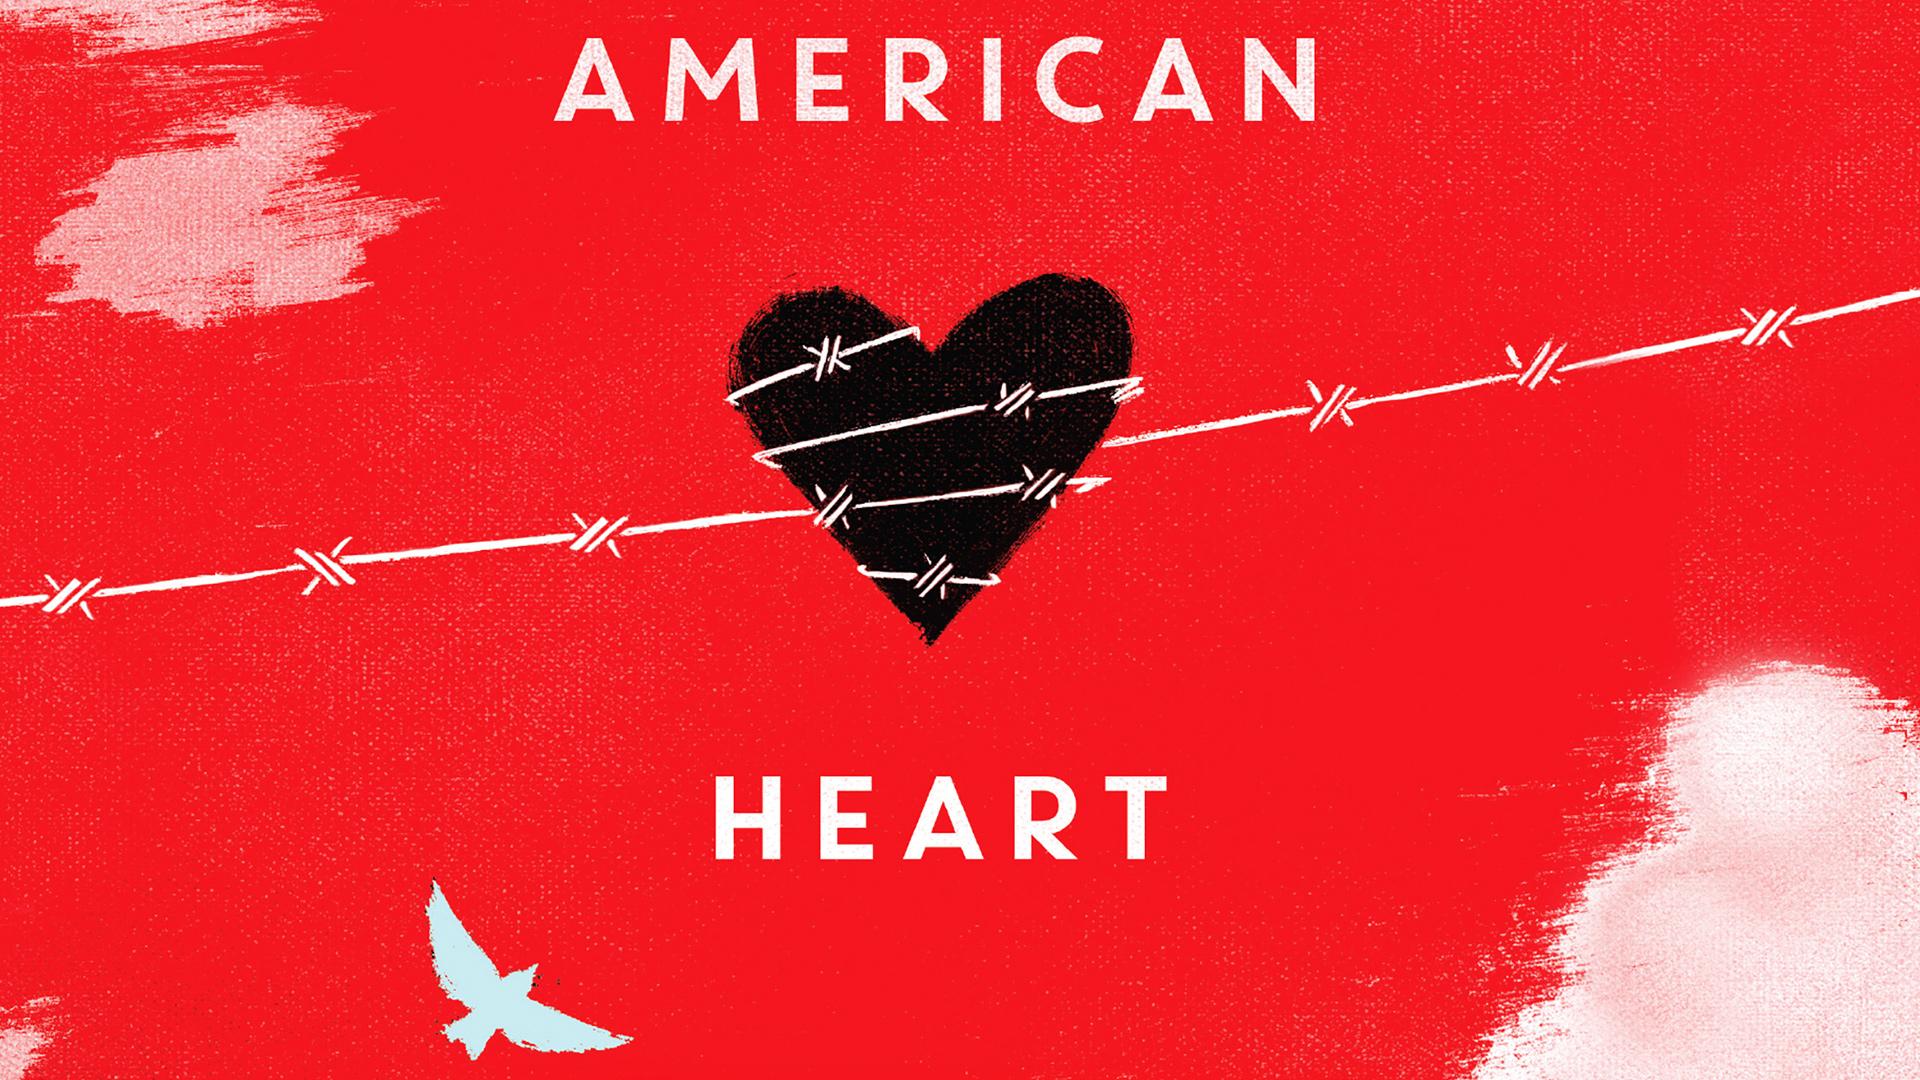 American Heart (2018)